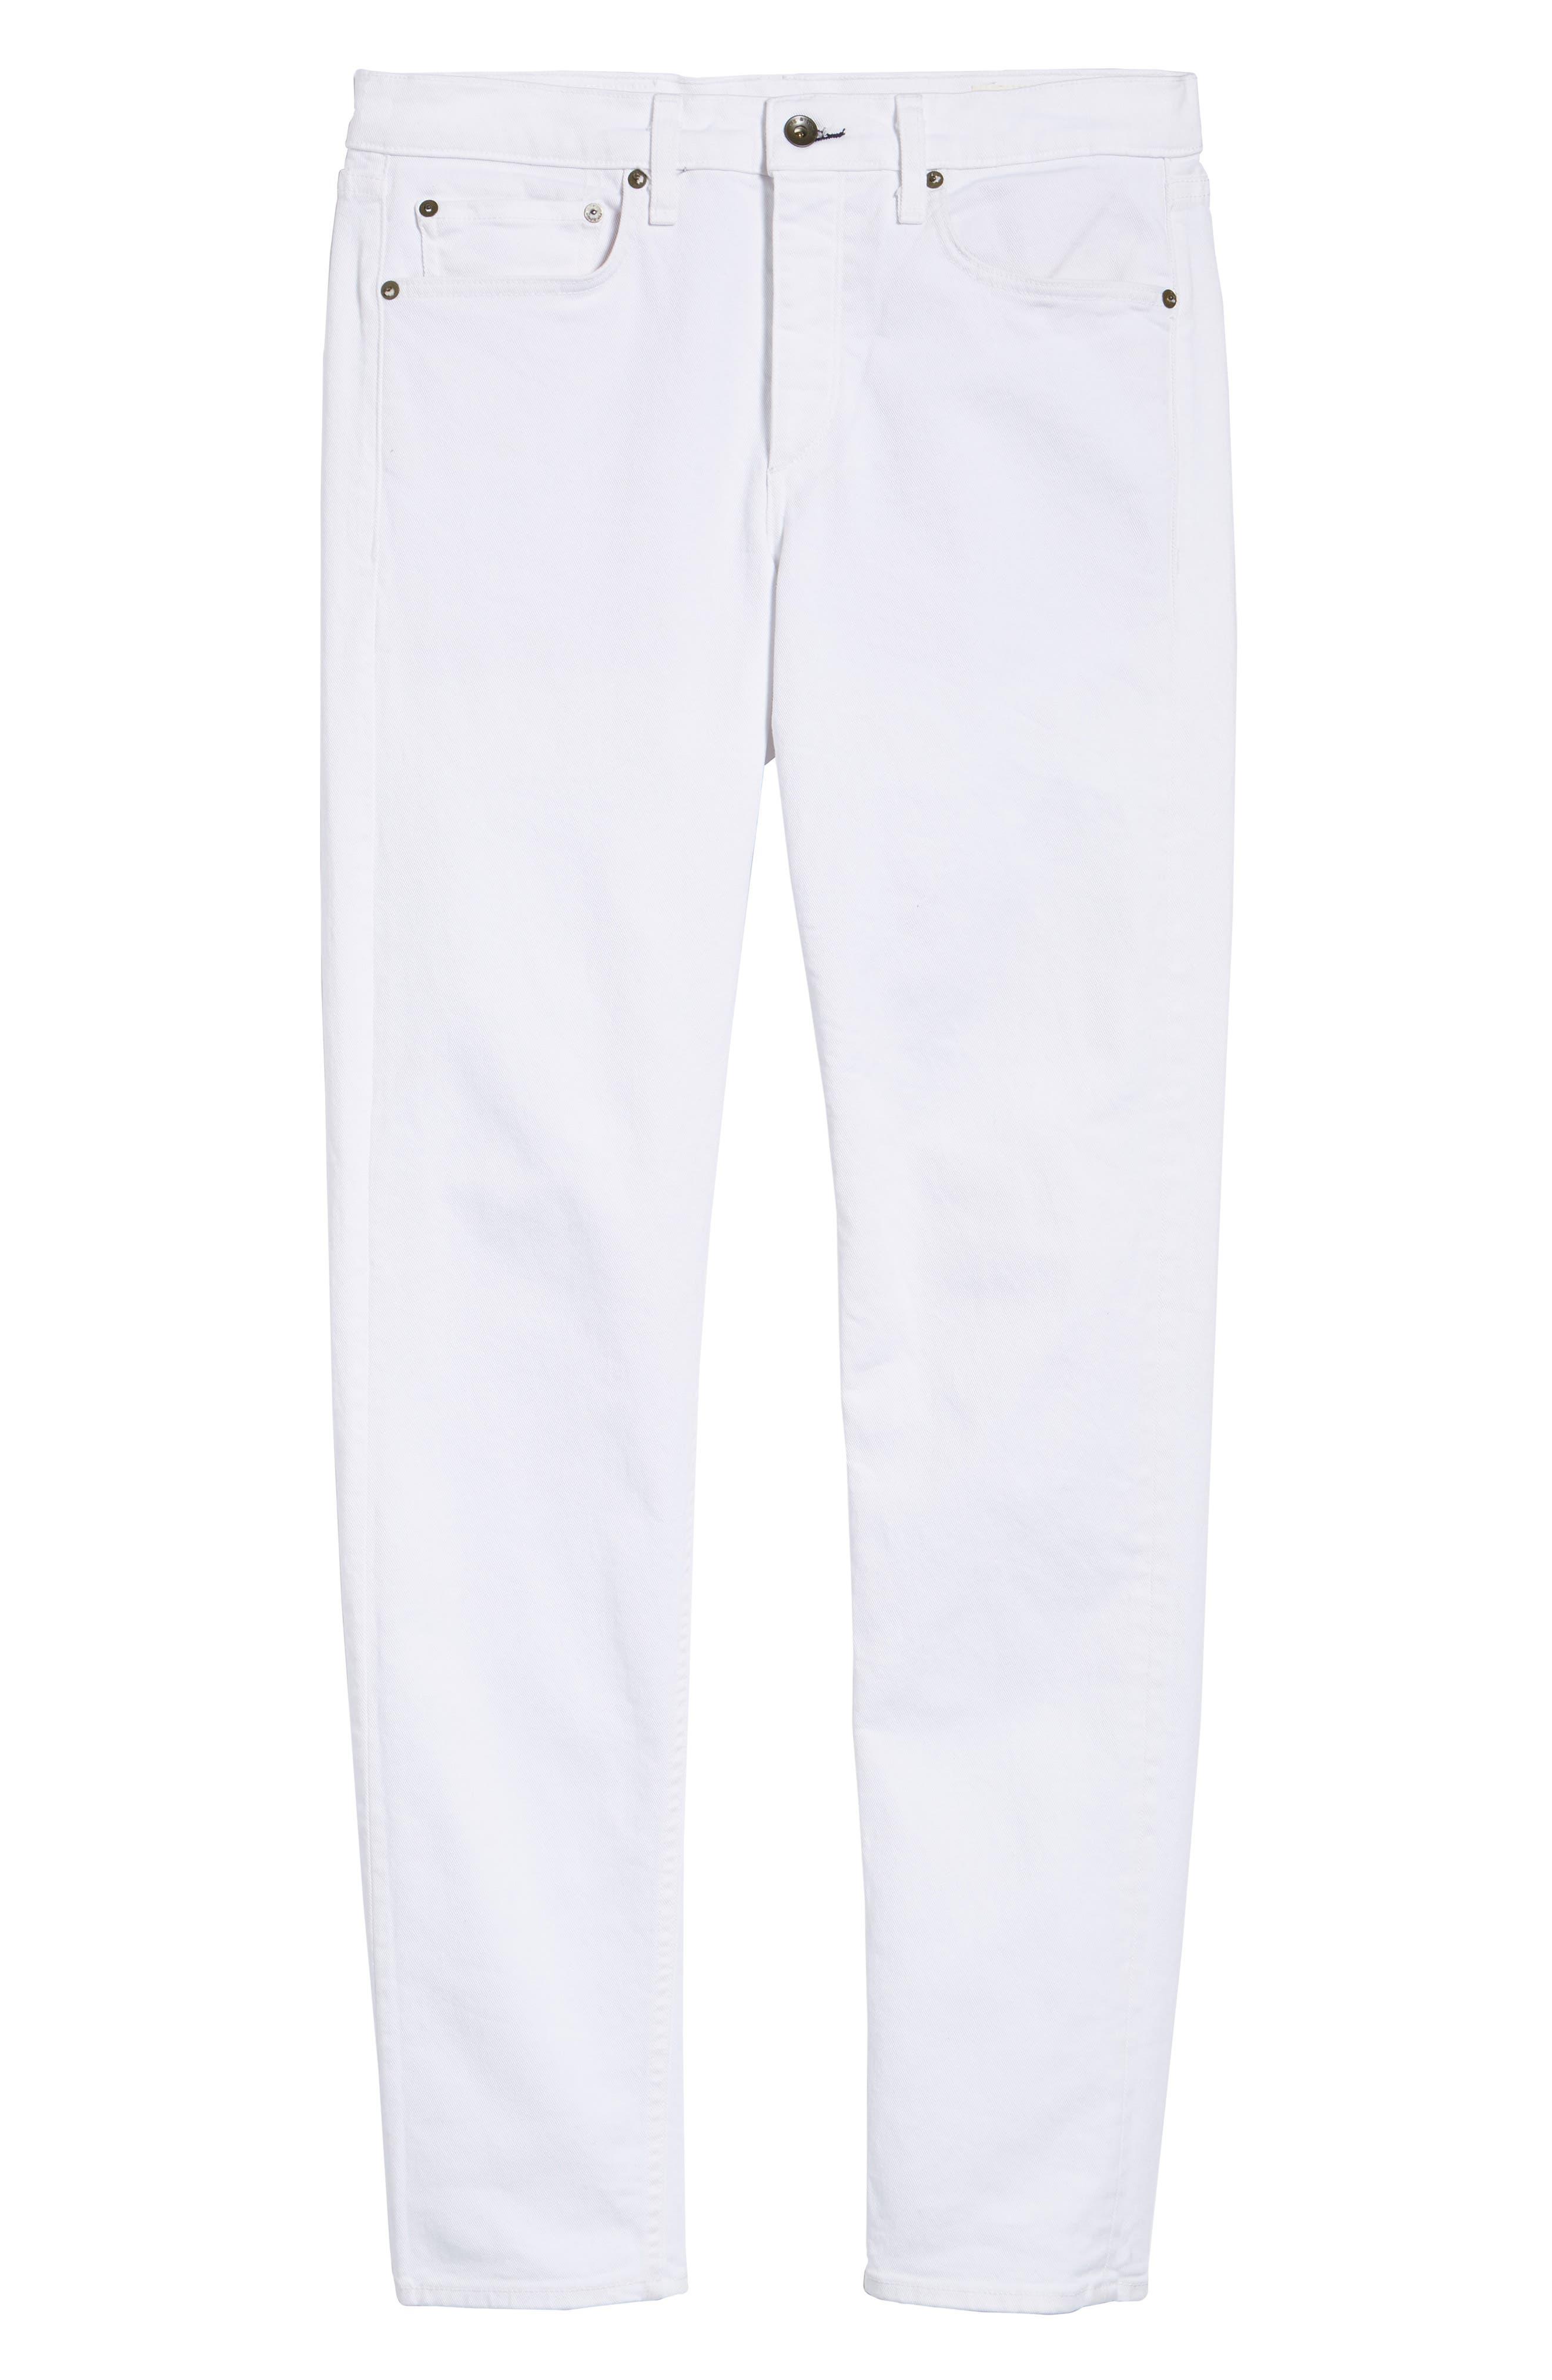 Fit 2 Slim Fit Jeans,                             Alternate thumbnail 6, color,                             White